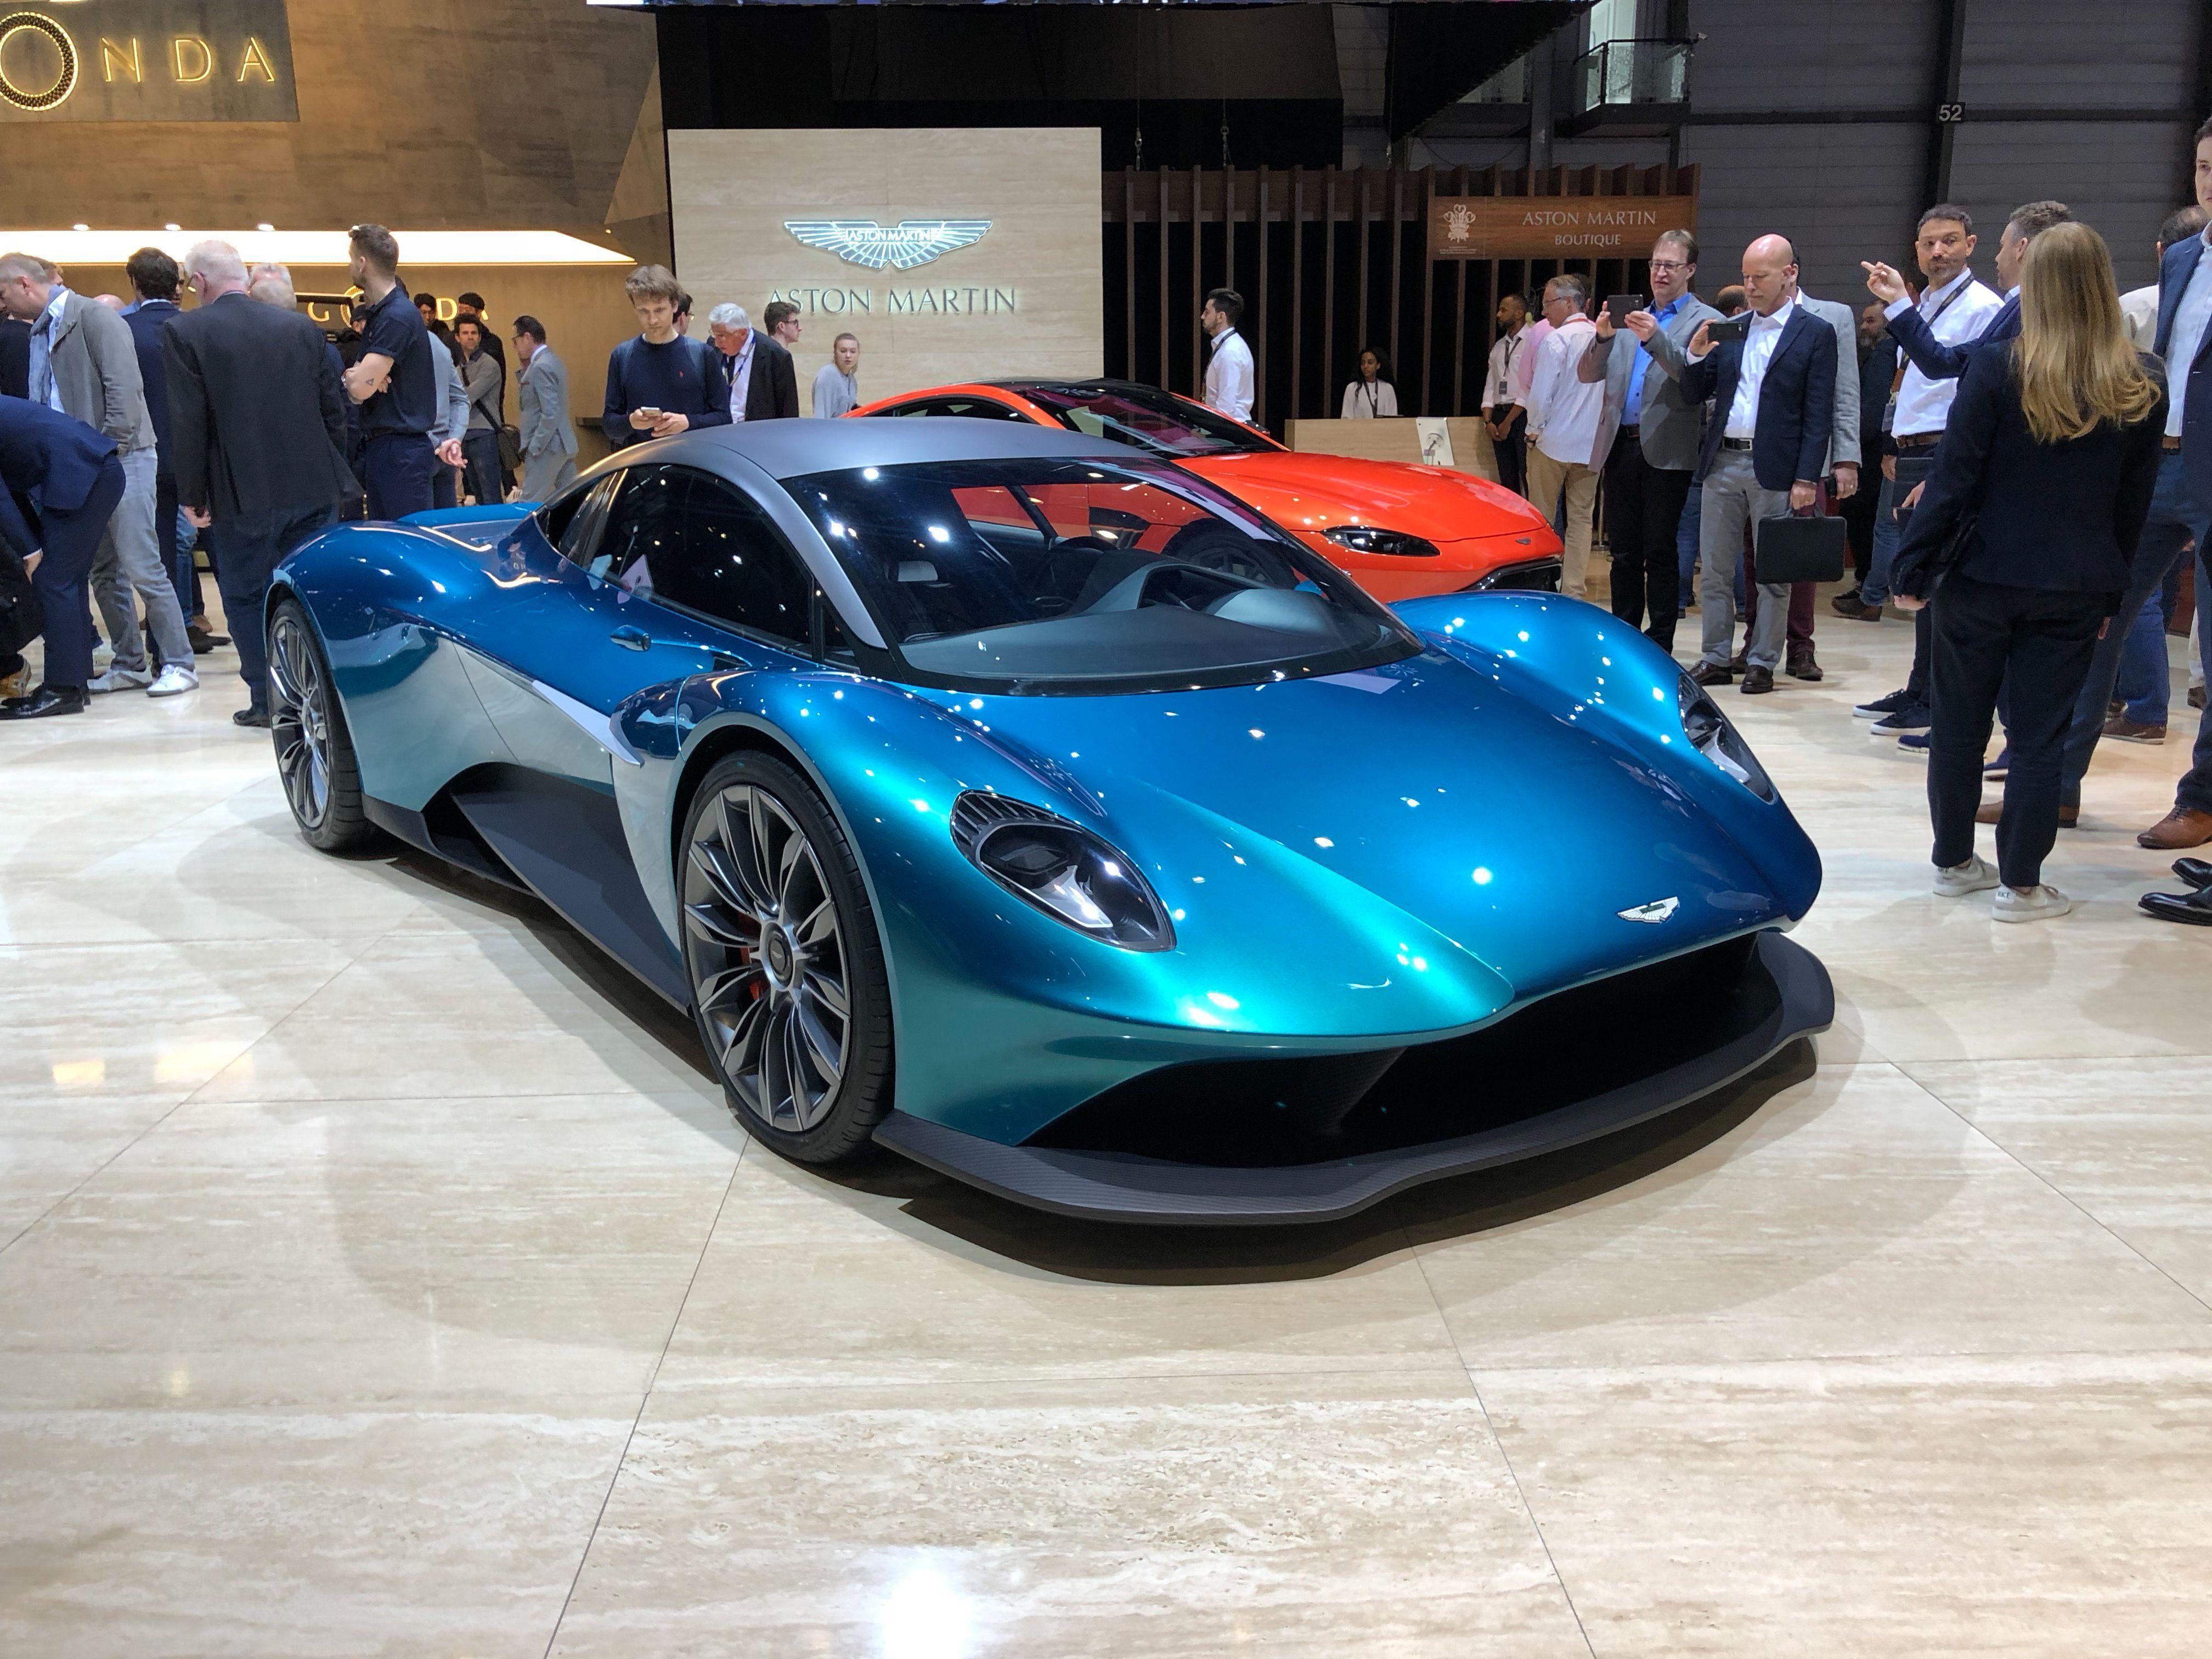 Aston Martin Vanquish Vision Di 2020